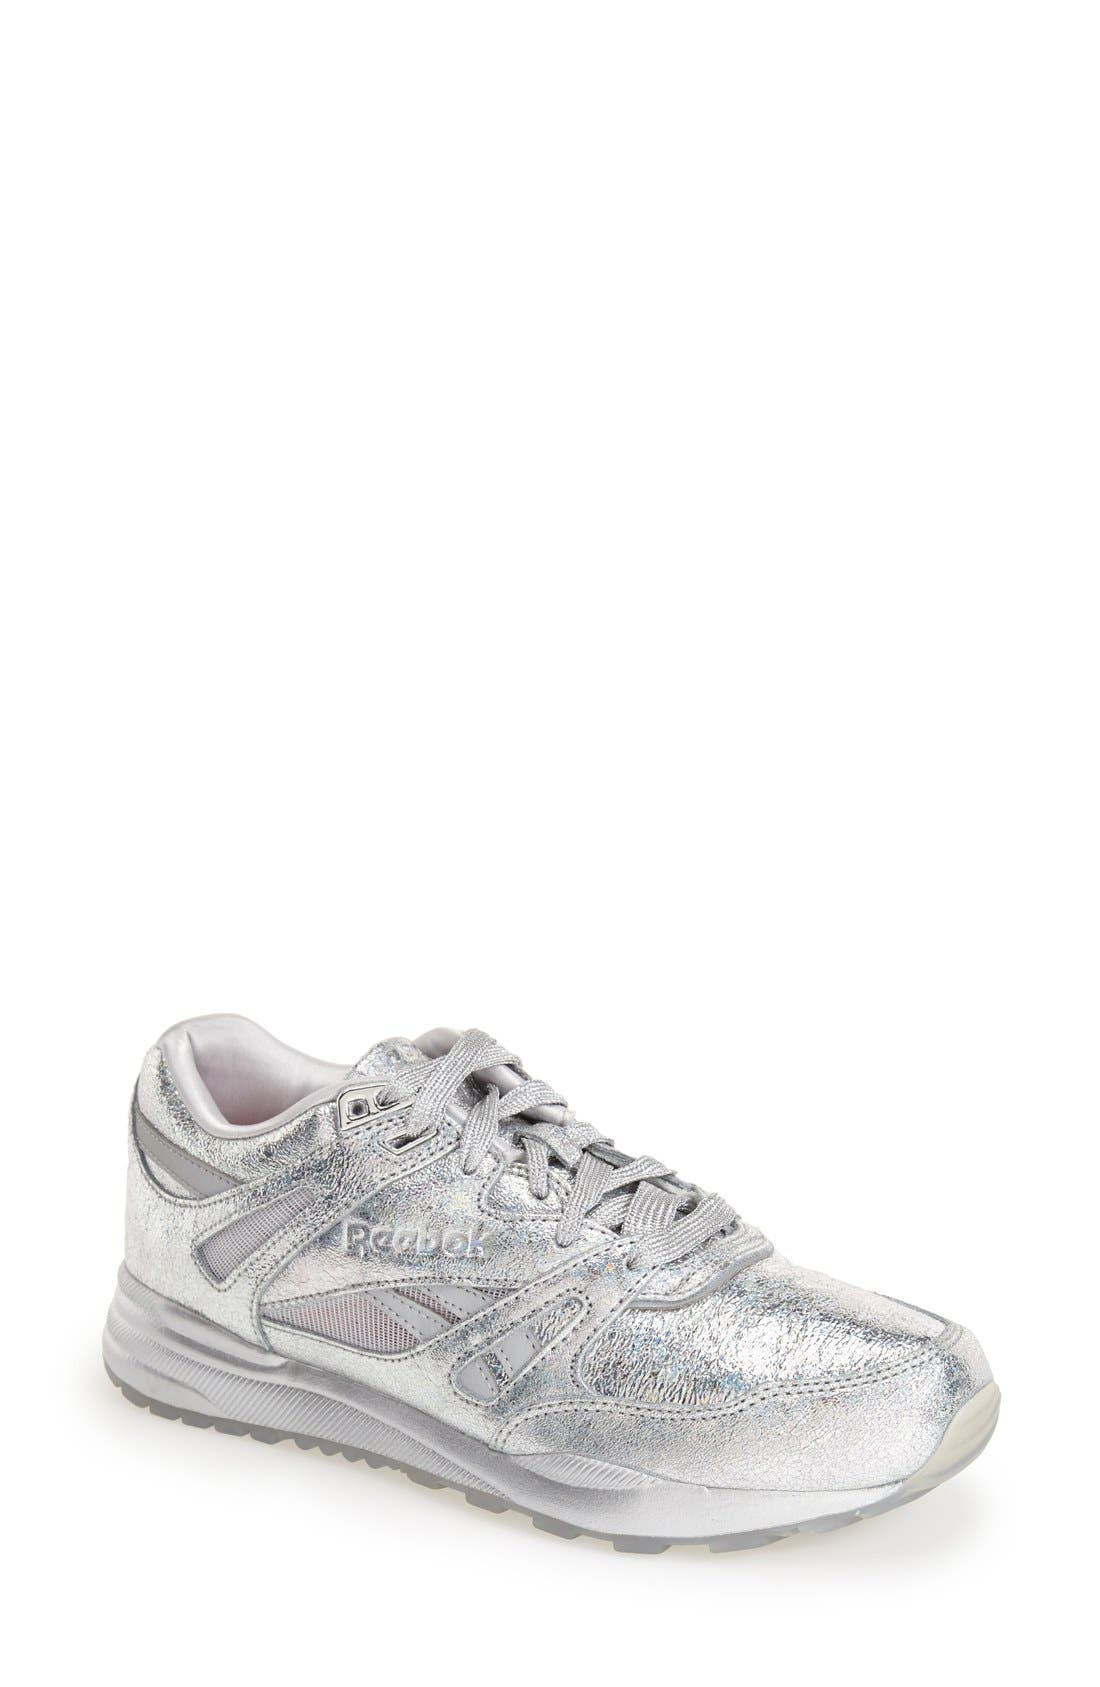 Main Image - Reebok 'Ventilator Rime' Sneaker (Women)